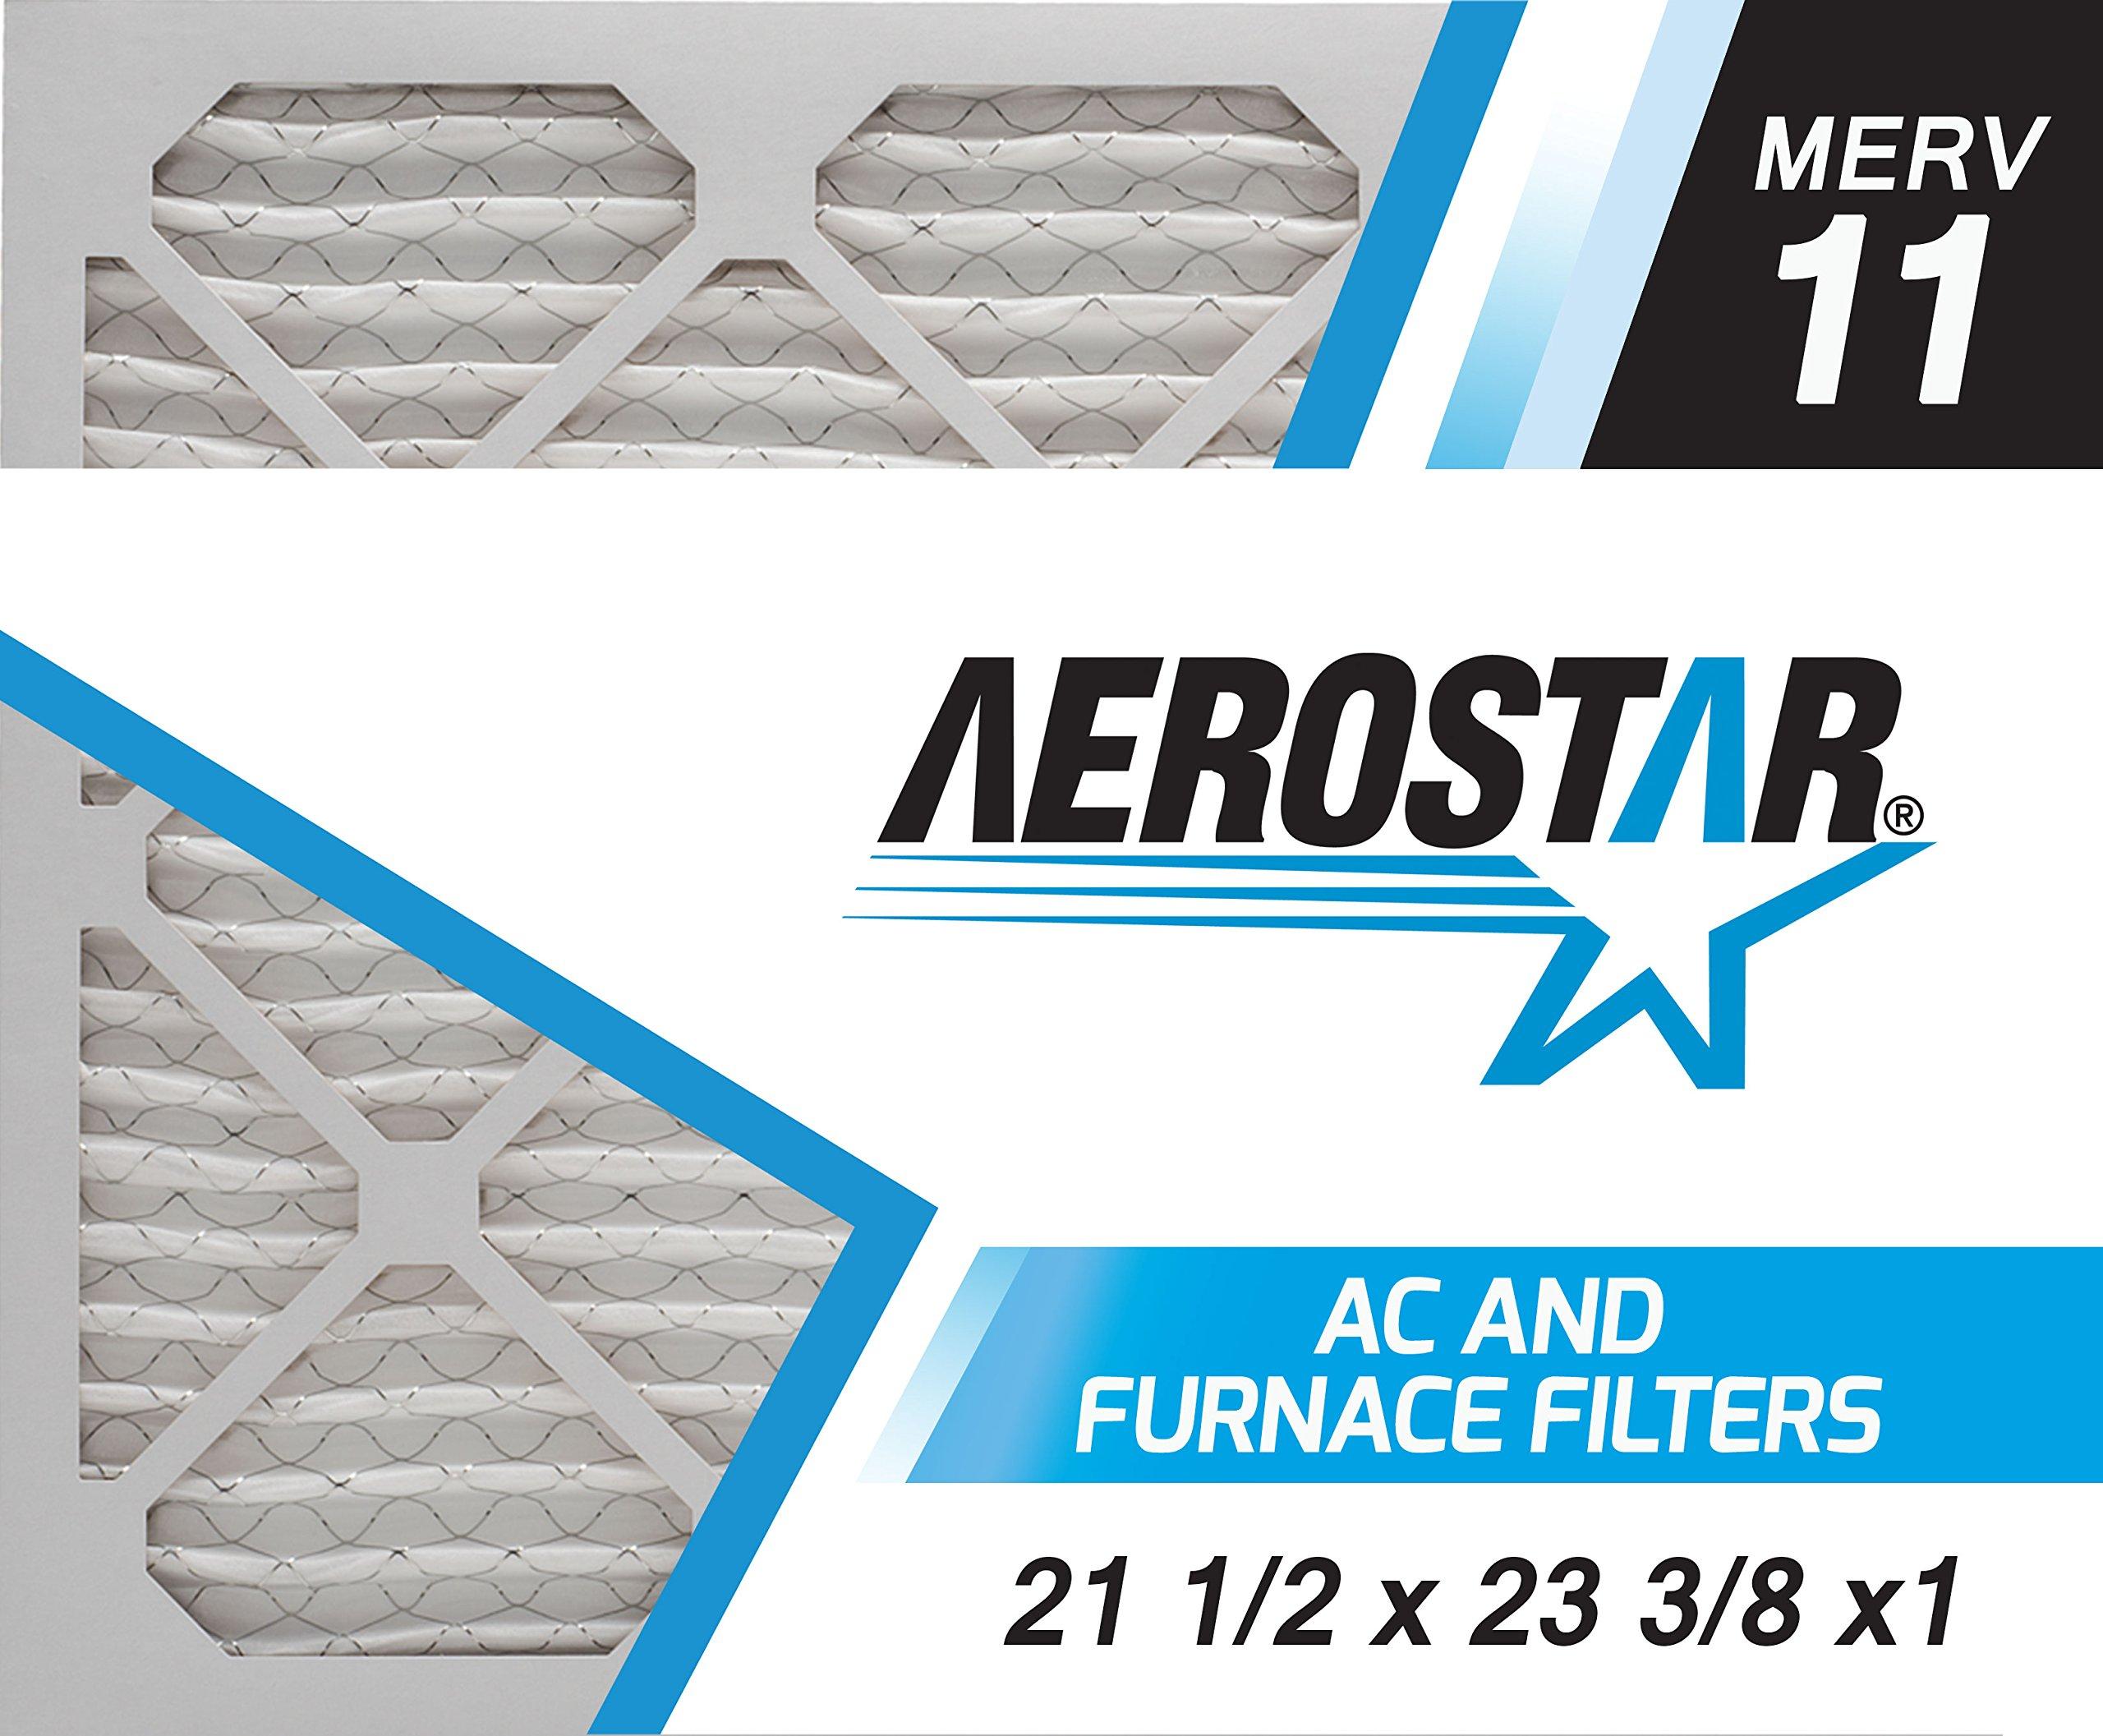 21 1/2 x 23 3/8 x 1 AC and Furnace Air Filter by Aerostar - MERV 11, Box of 12